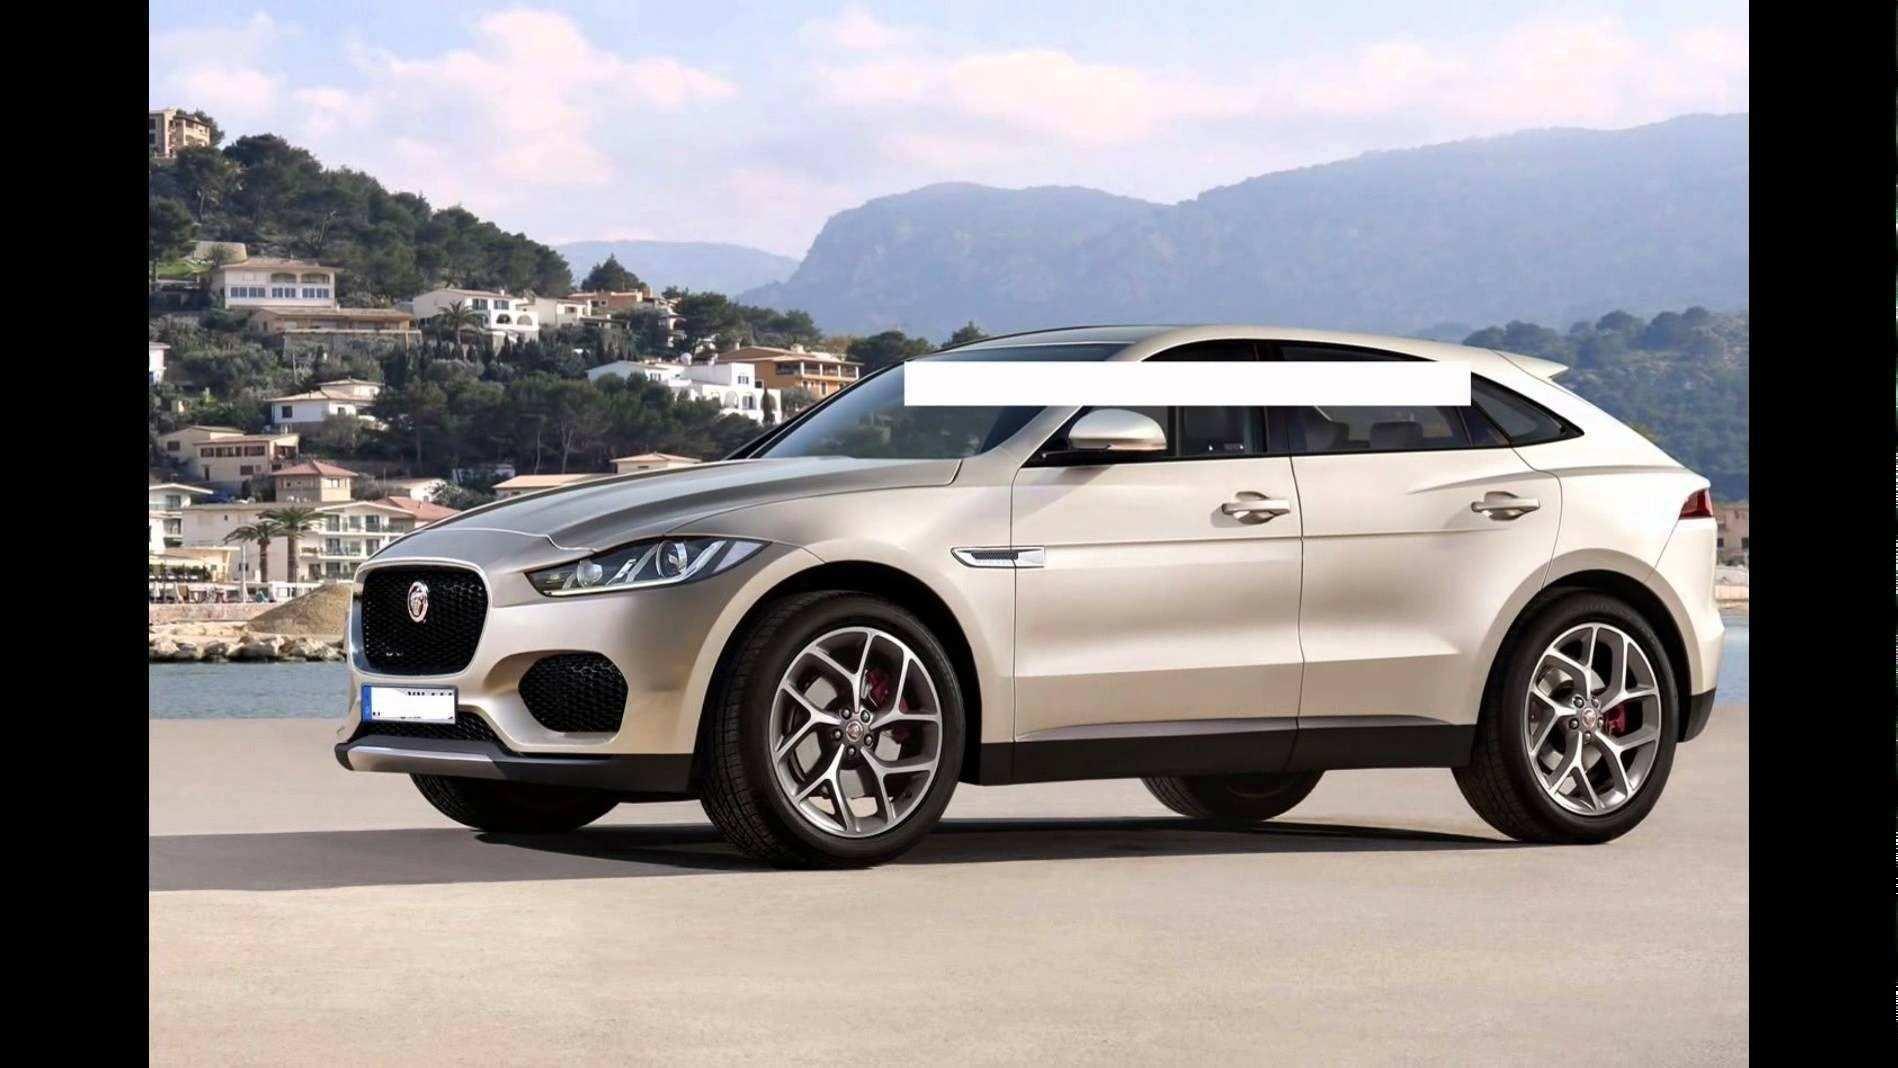 35 All New Suv Jaguar 2020 Release with Suv Jaguar 2020